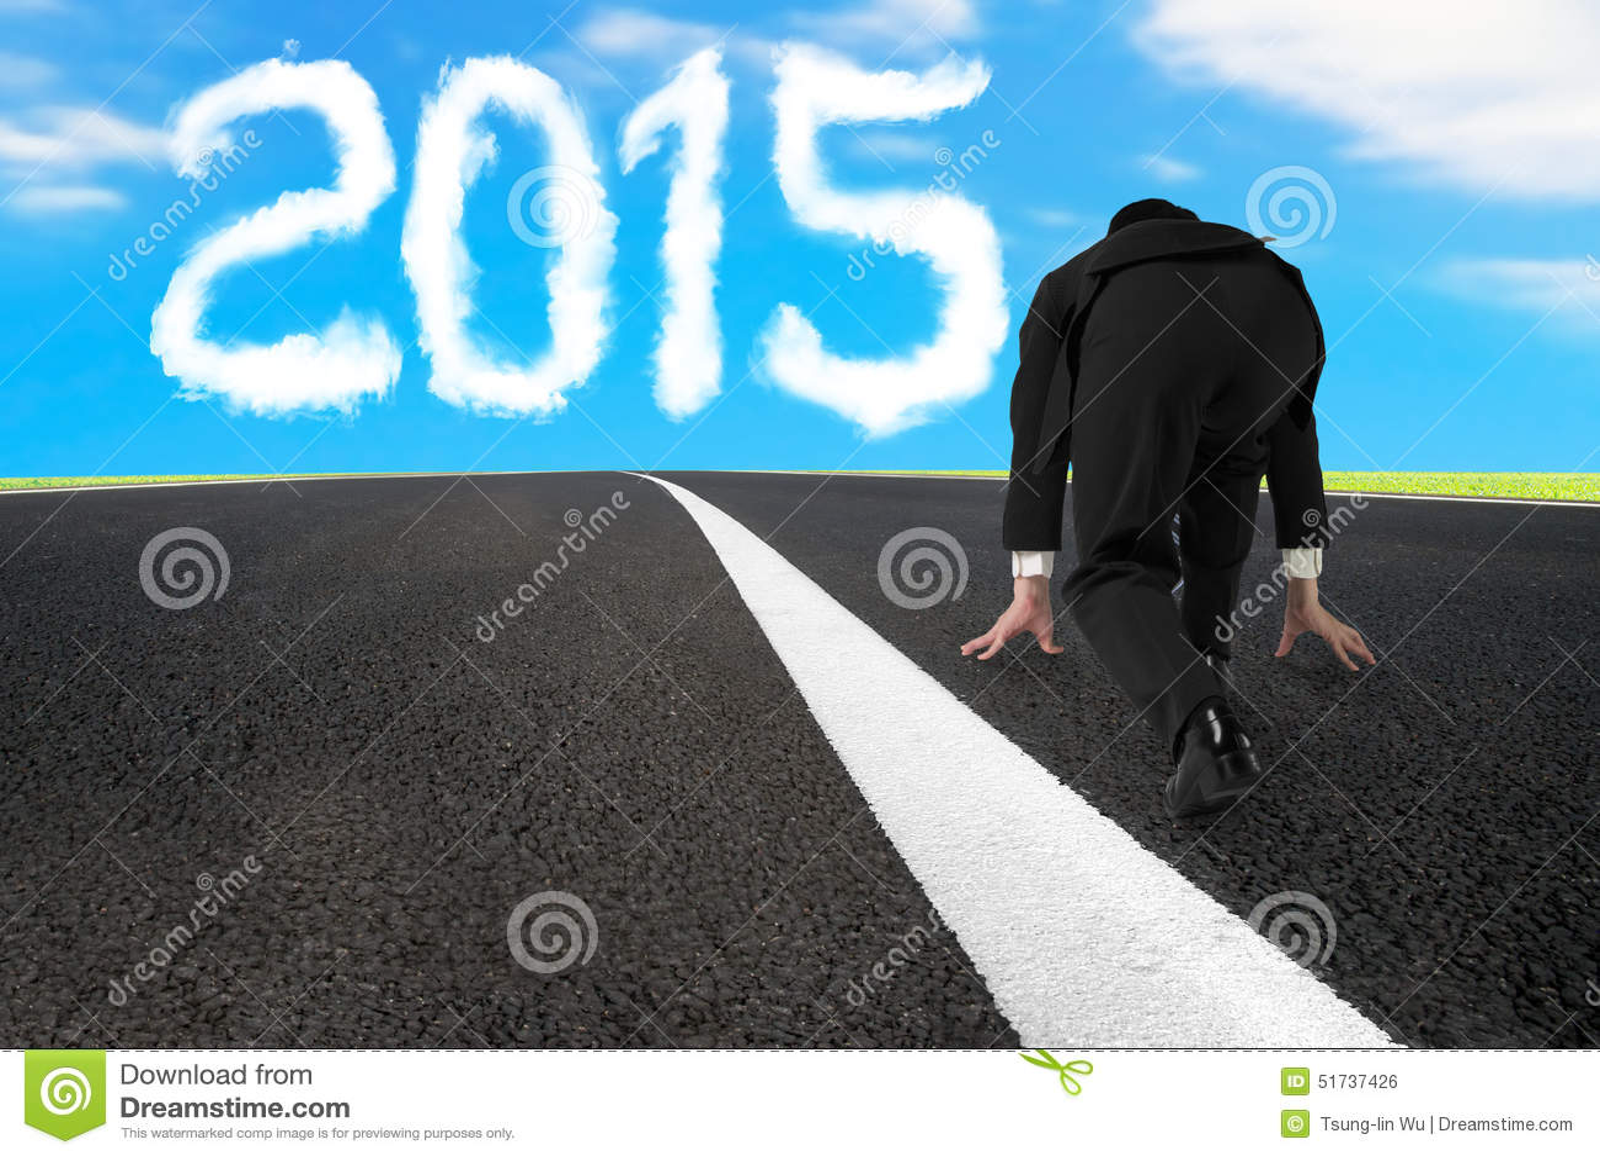 Businessman ready to run on asphalt road with 2015 cloud